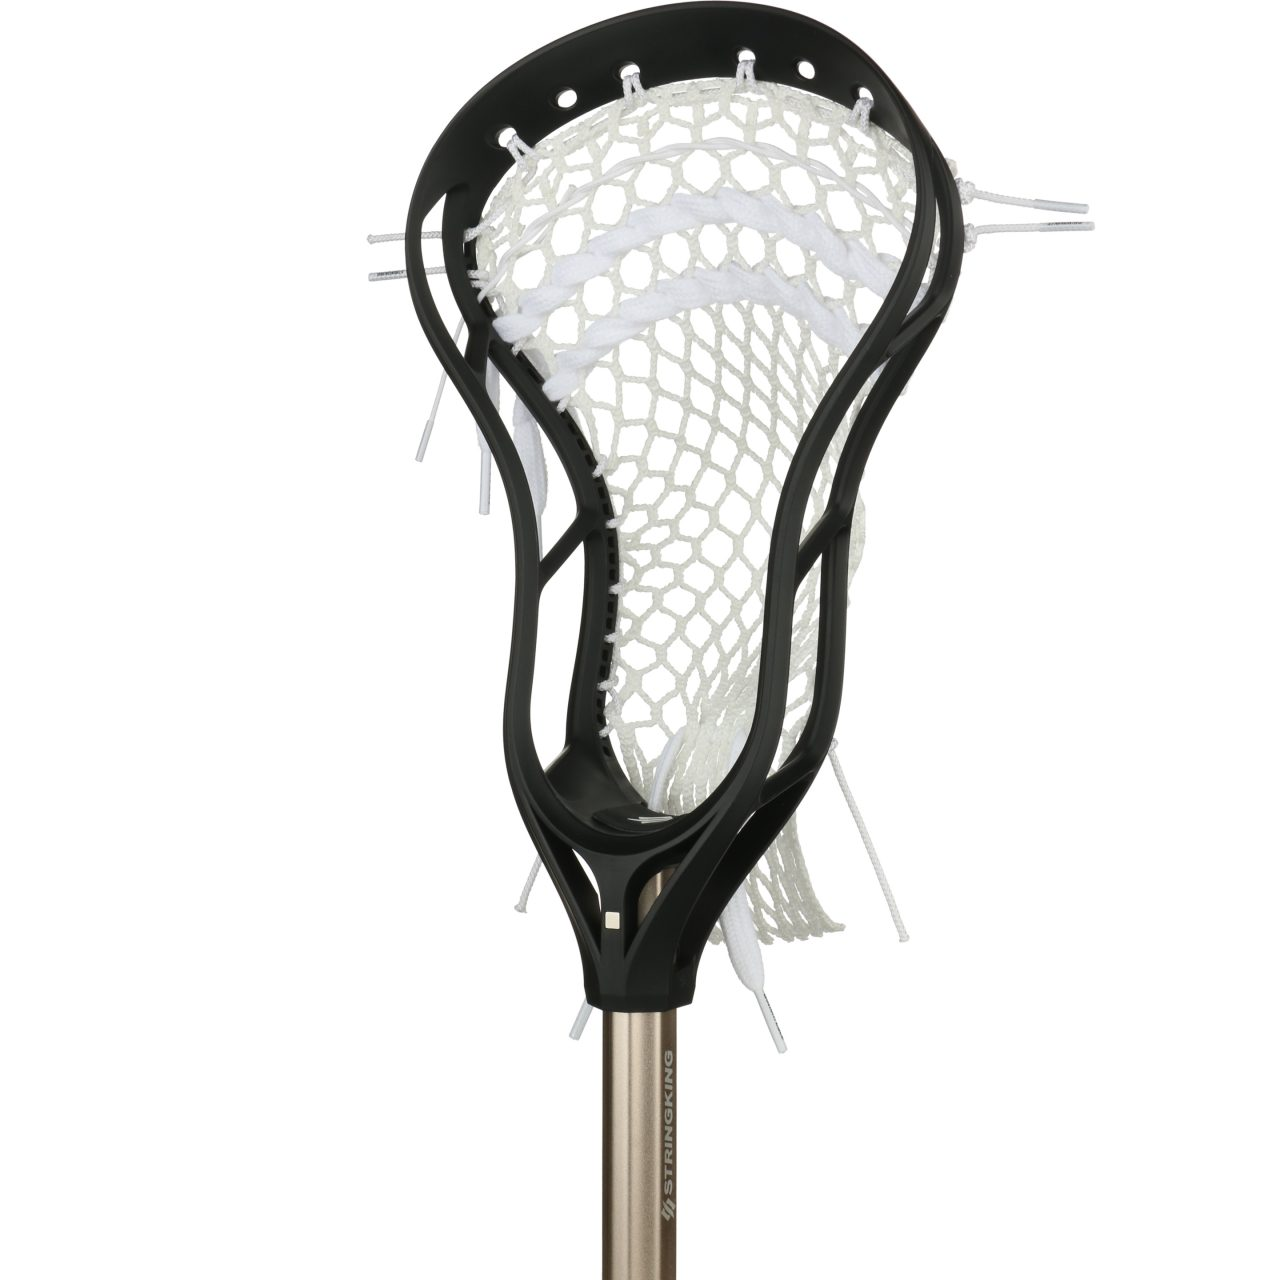 StringKing-Complete-2-JR-Lacrosse-Stick-Black-Nickel-Angle-1280x1280.jpg